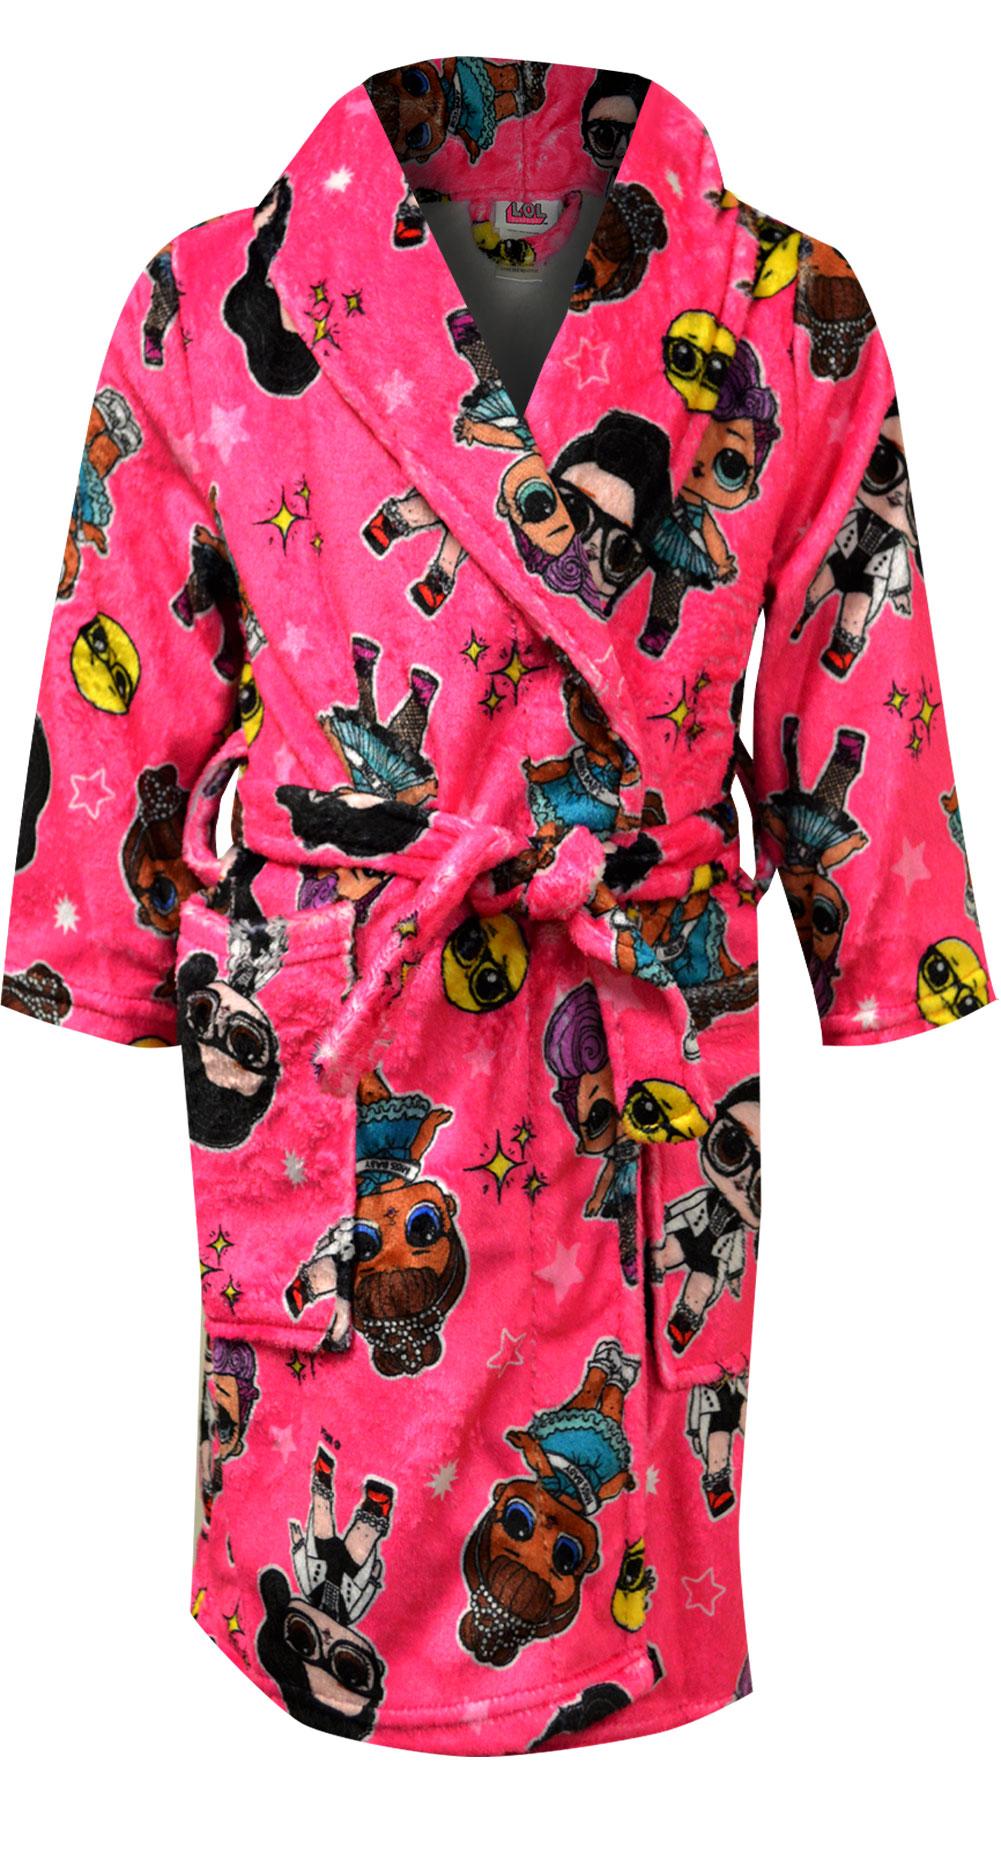 Image of LOL Surprise Pink Plush Robe for girls